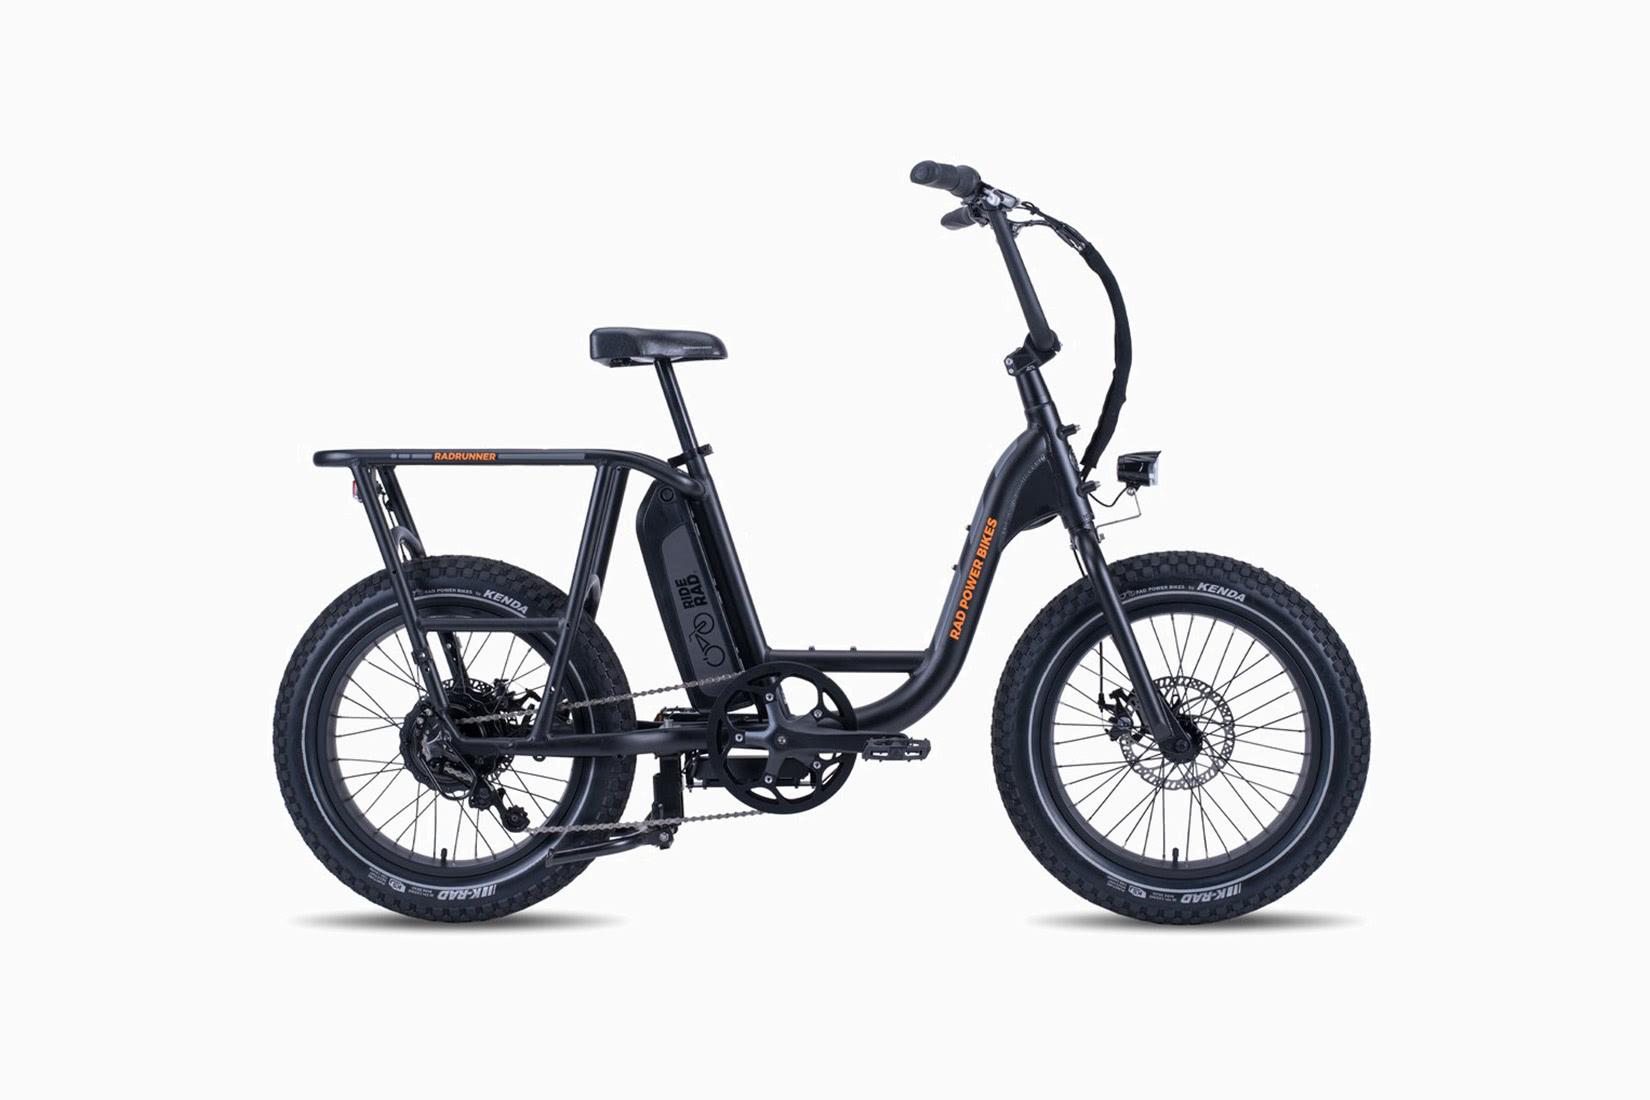 rad power bikes review radrunner luxe digital